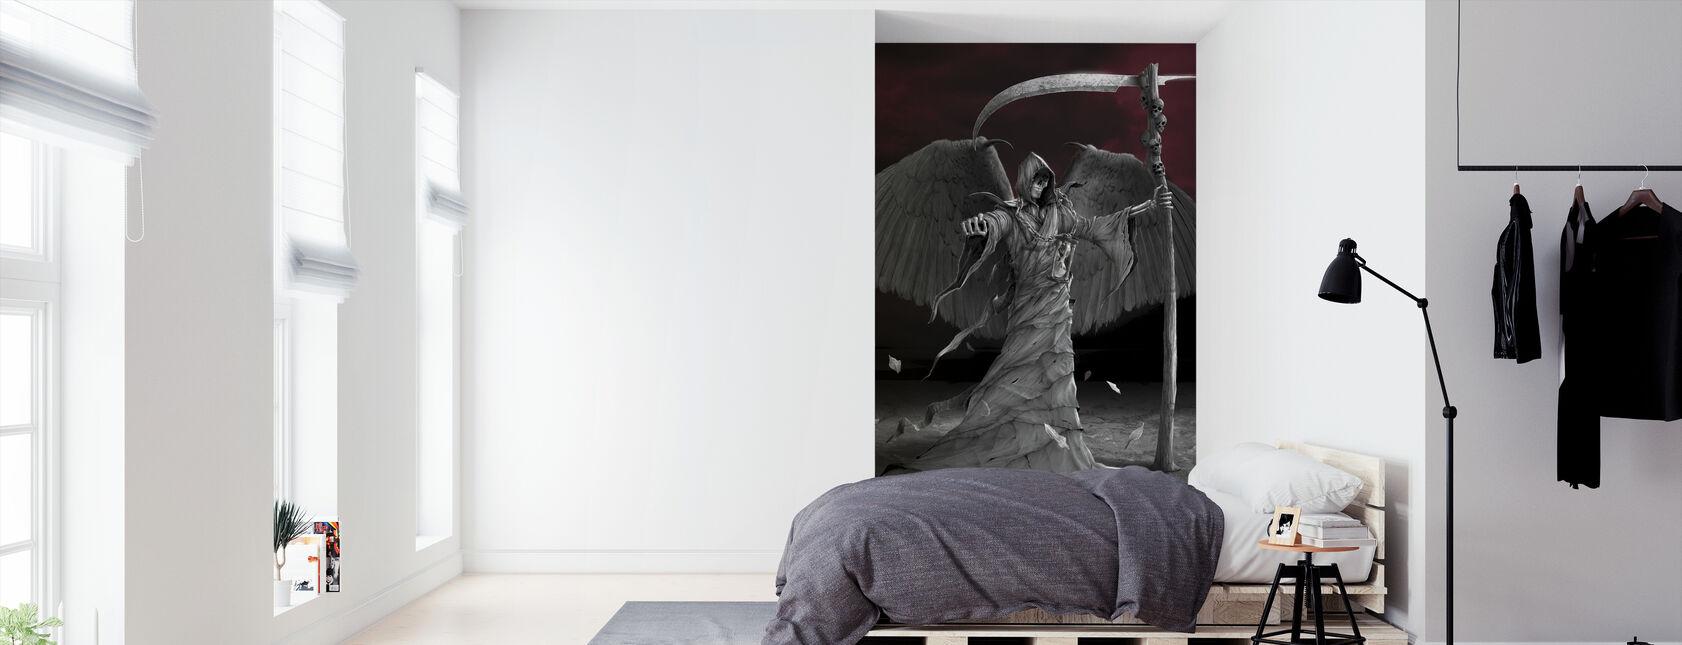 Time is Up - Wallpaper - Bedroom